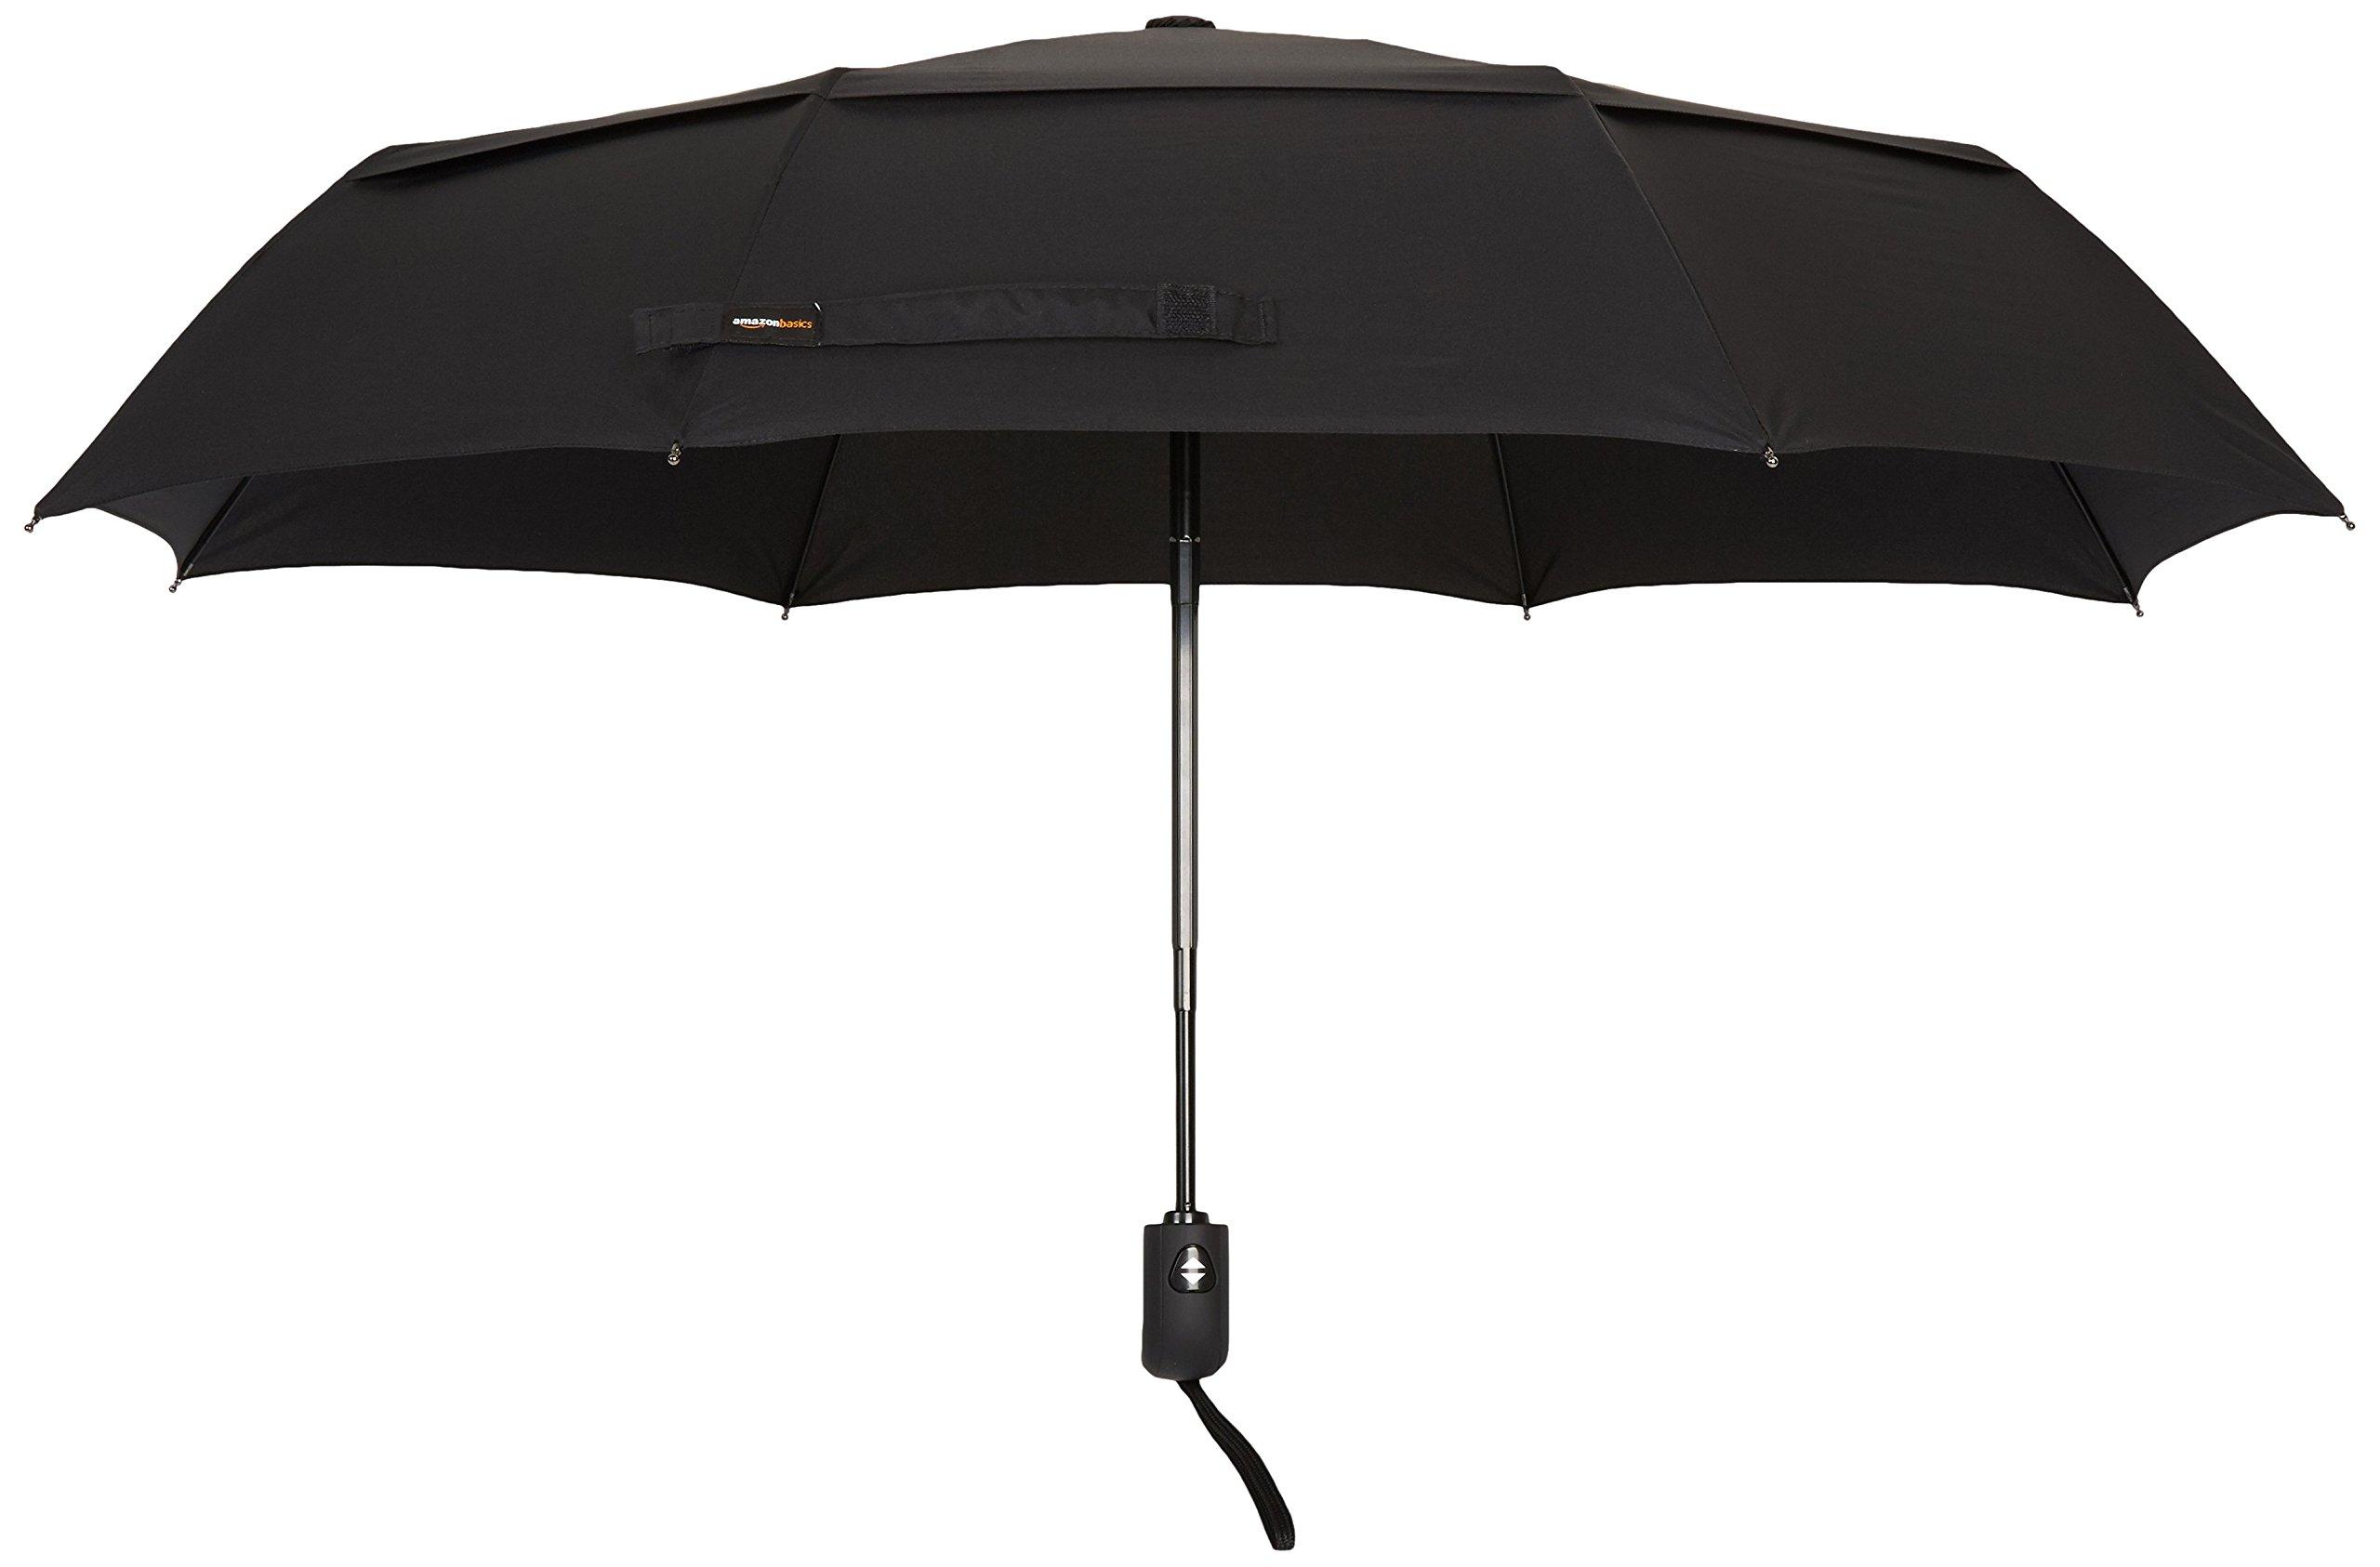 AmazonBasics Umbrella with Wind Vent, Light Blue 2